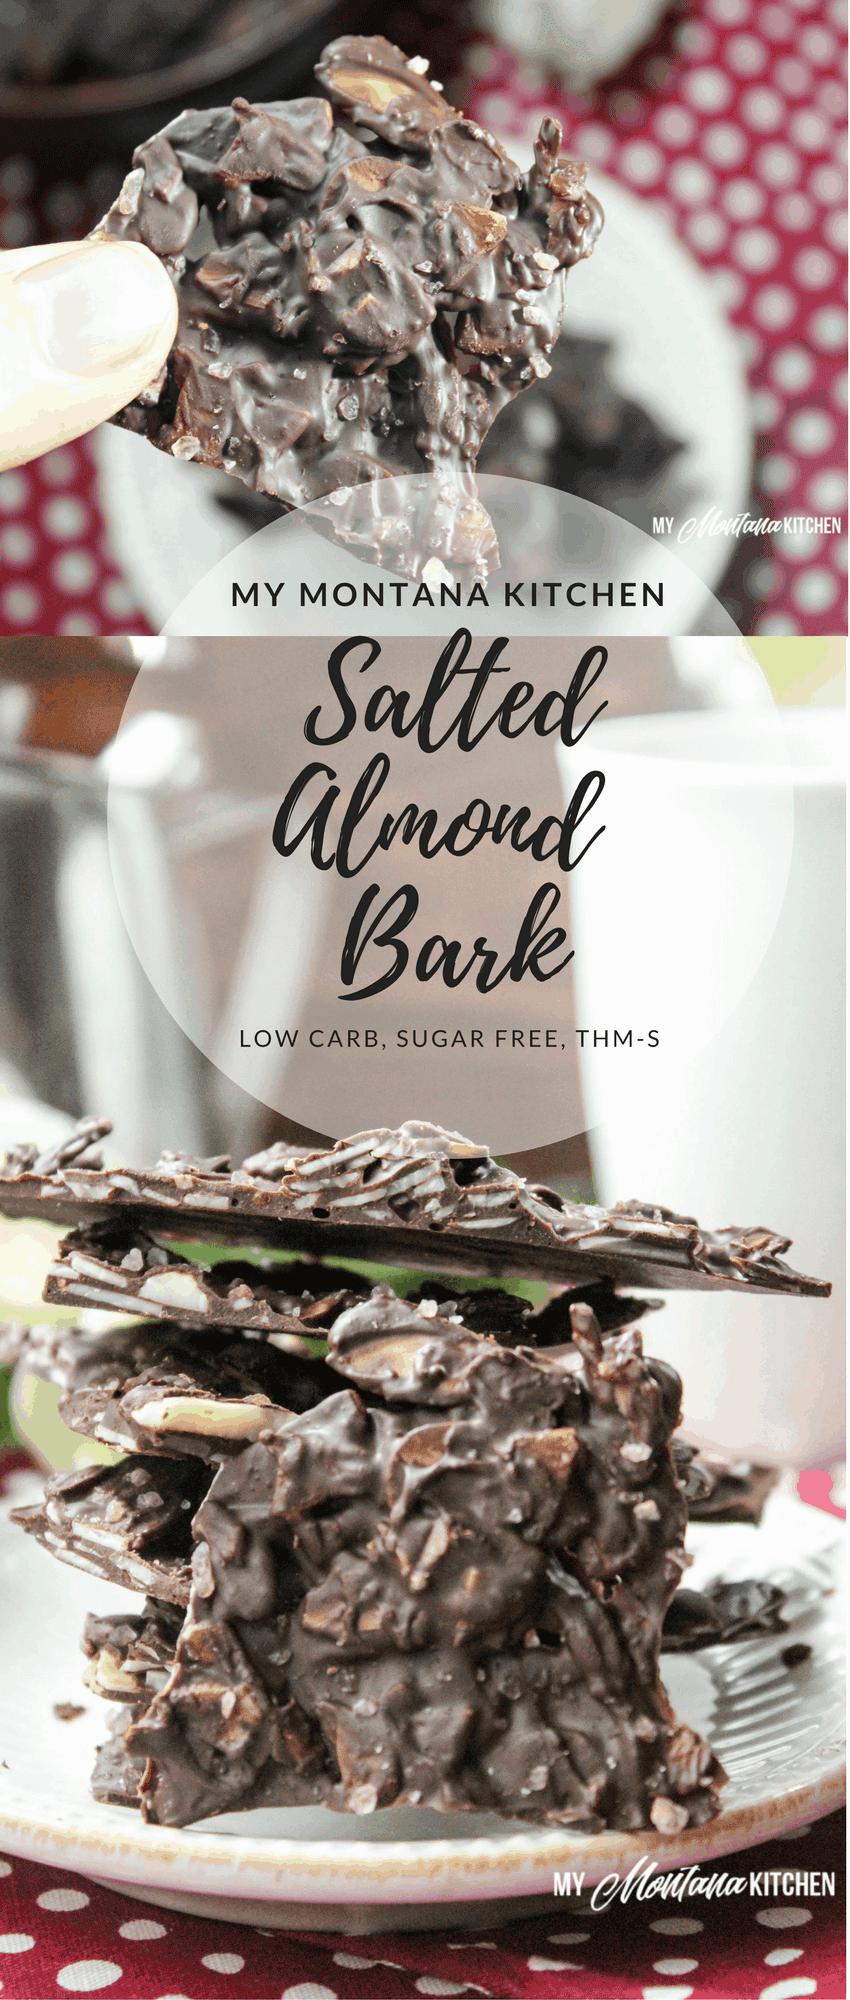 Salted Almond Bark (Low Carb, Sugar Free, THM-S, Dairy Free) #trimhealthymama #almondbark #lowcarb #sugarfree #thm #mymontanakitchen #chocolatebark